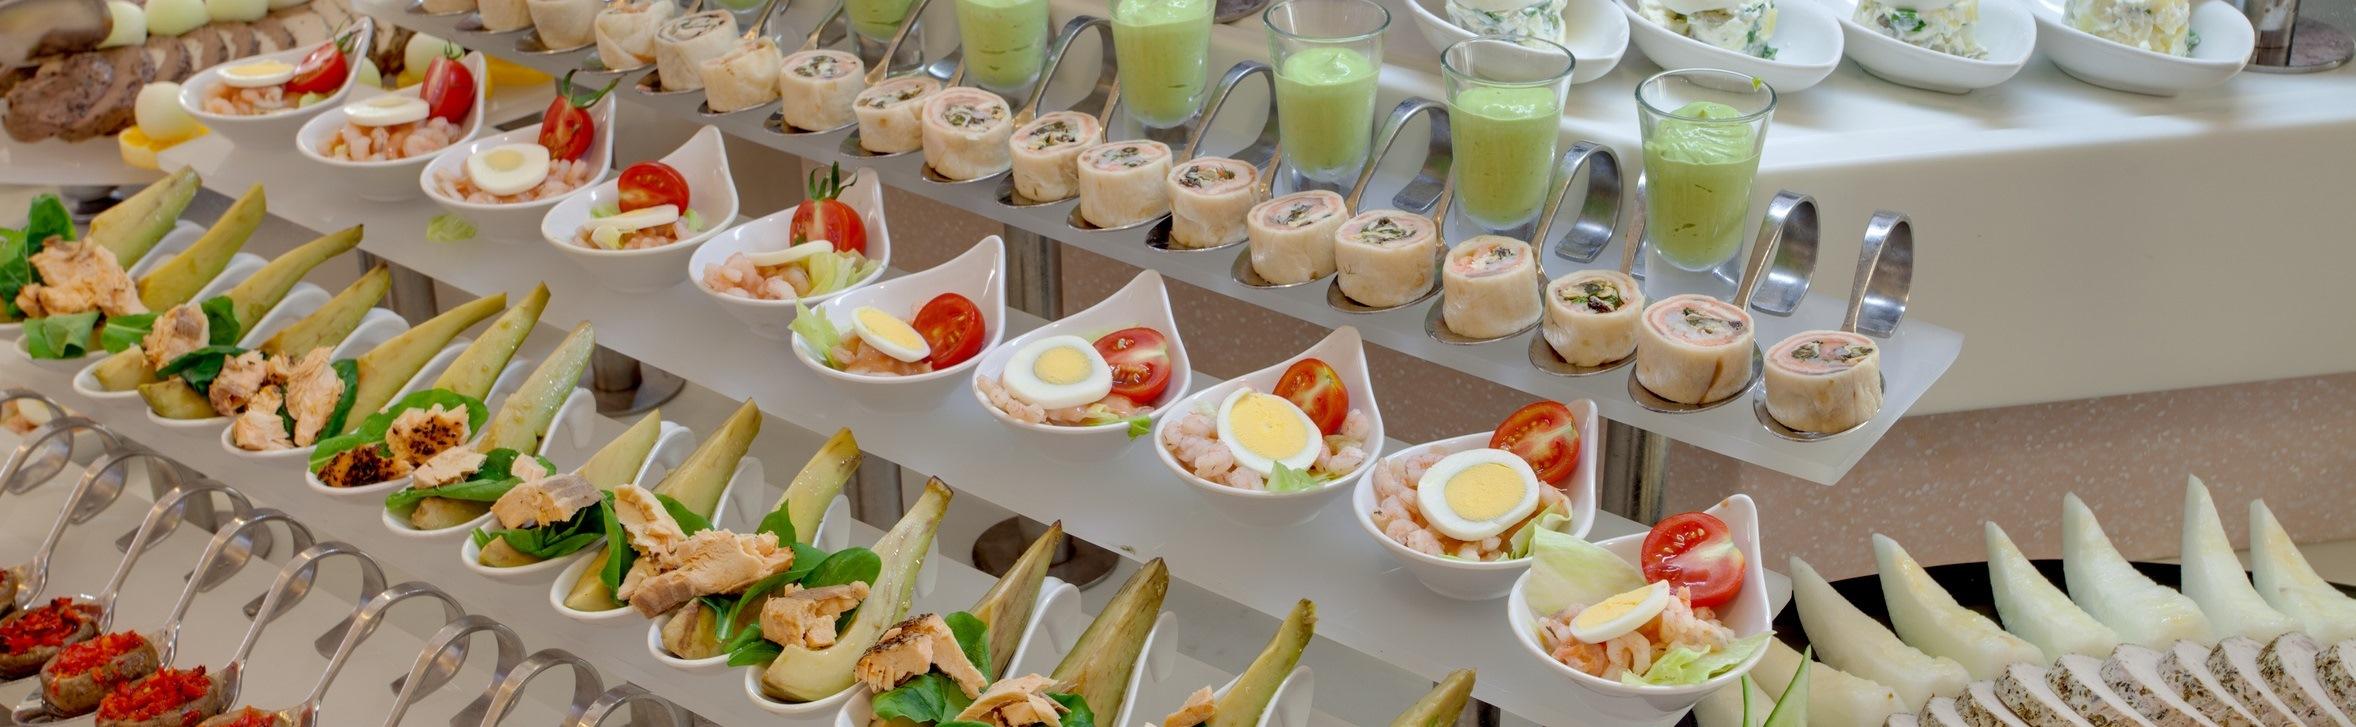 Catering Hannover Fingerfood - Kopie